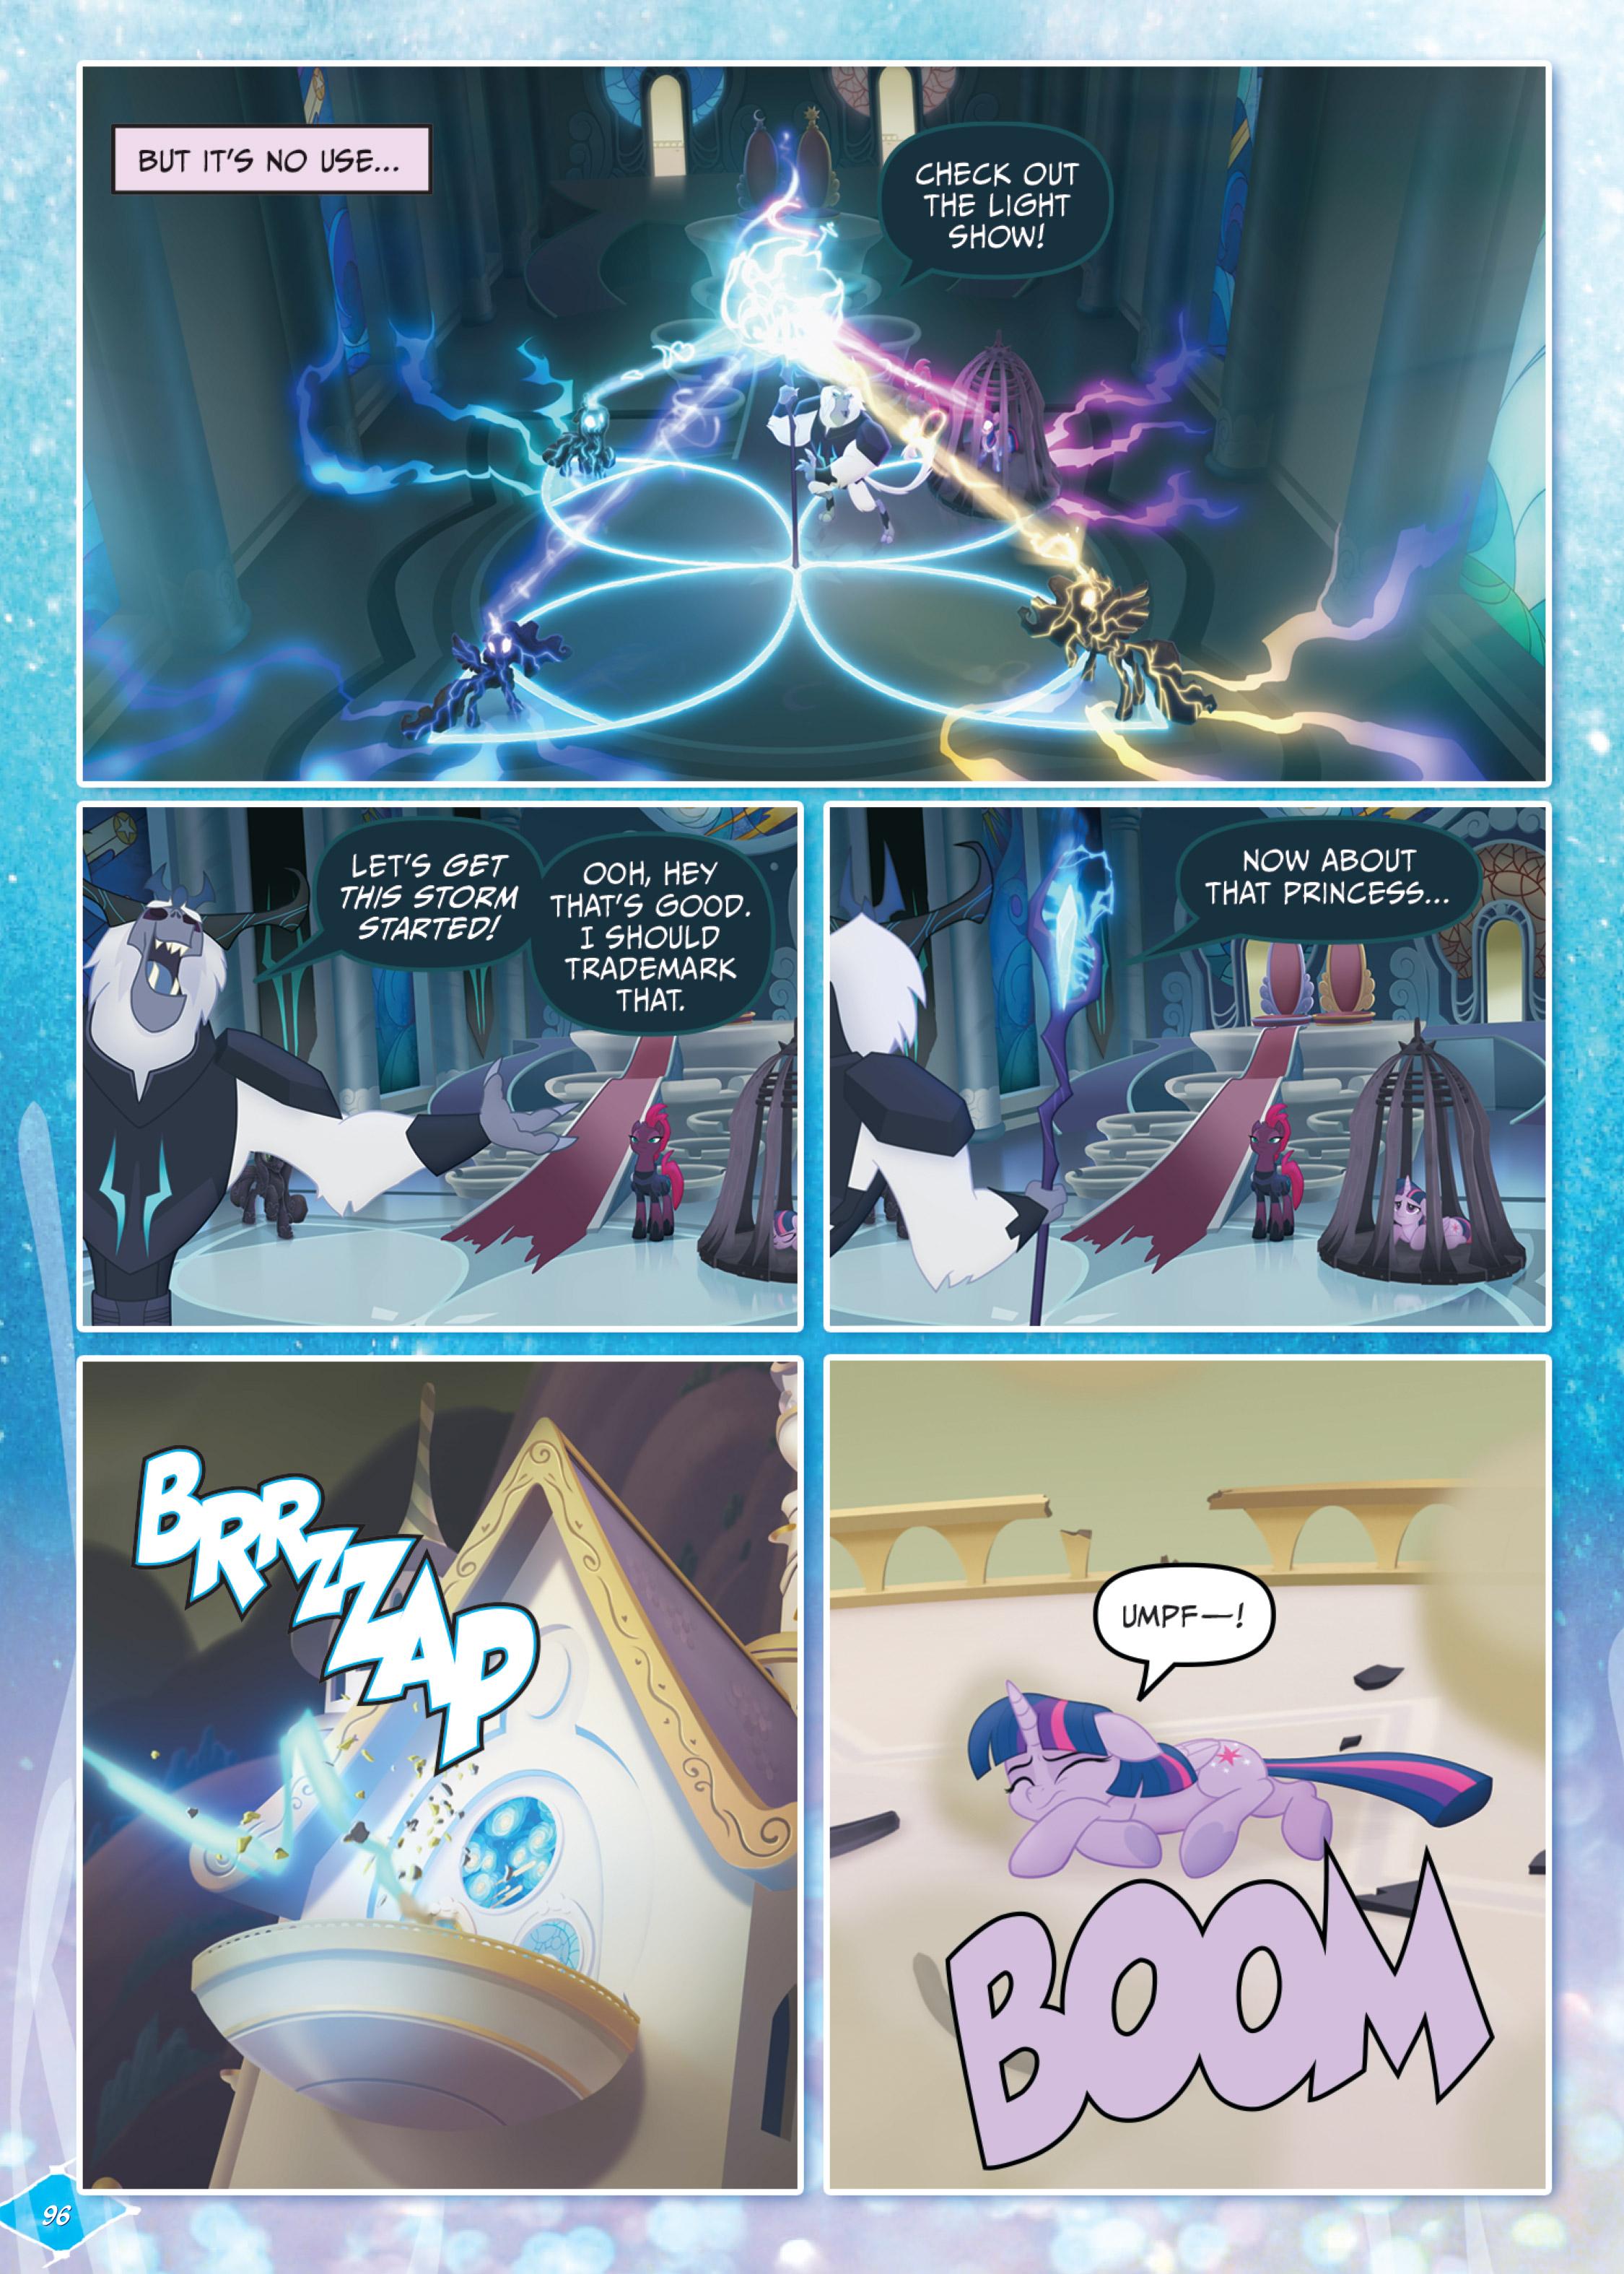 我的小马:电影改编(2017): Chapter 1 - Page 我的小马:电影改编(2017)